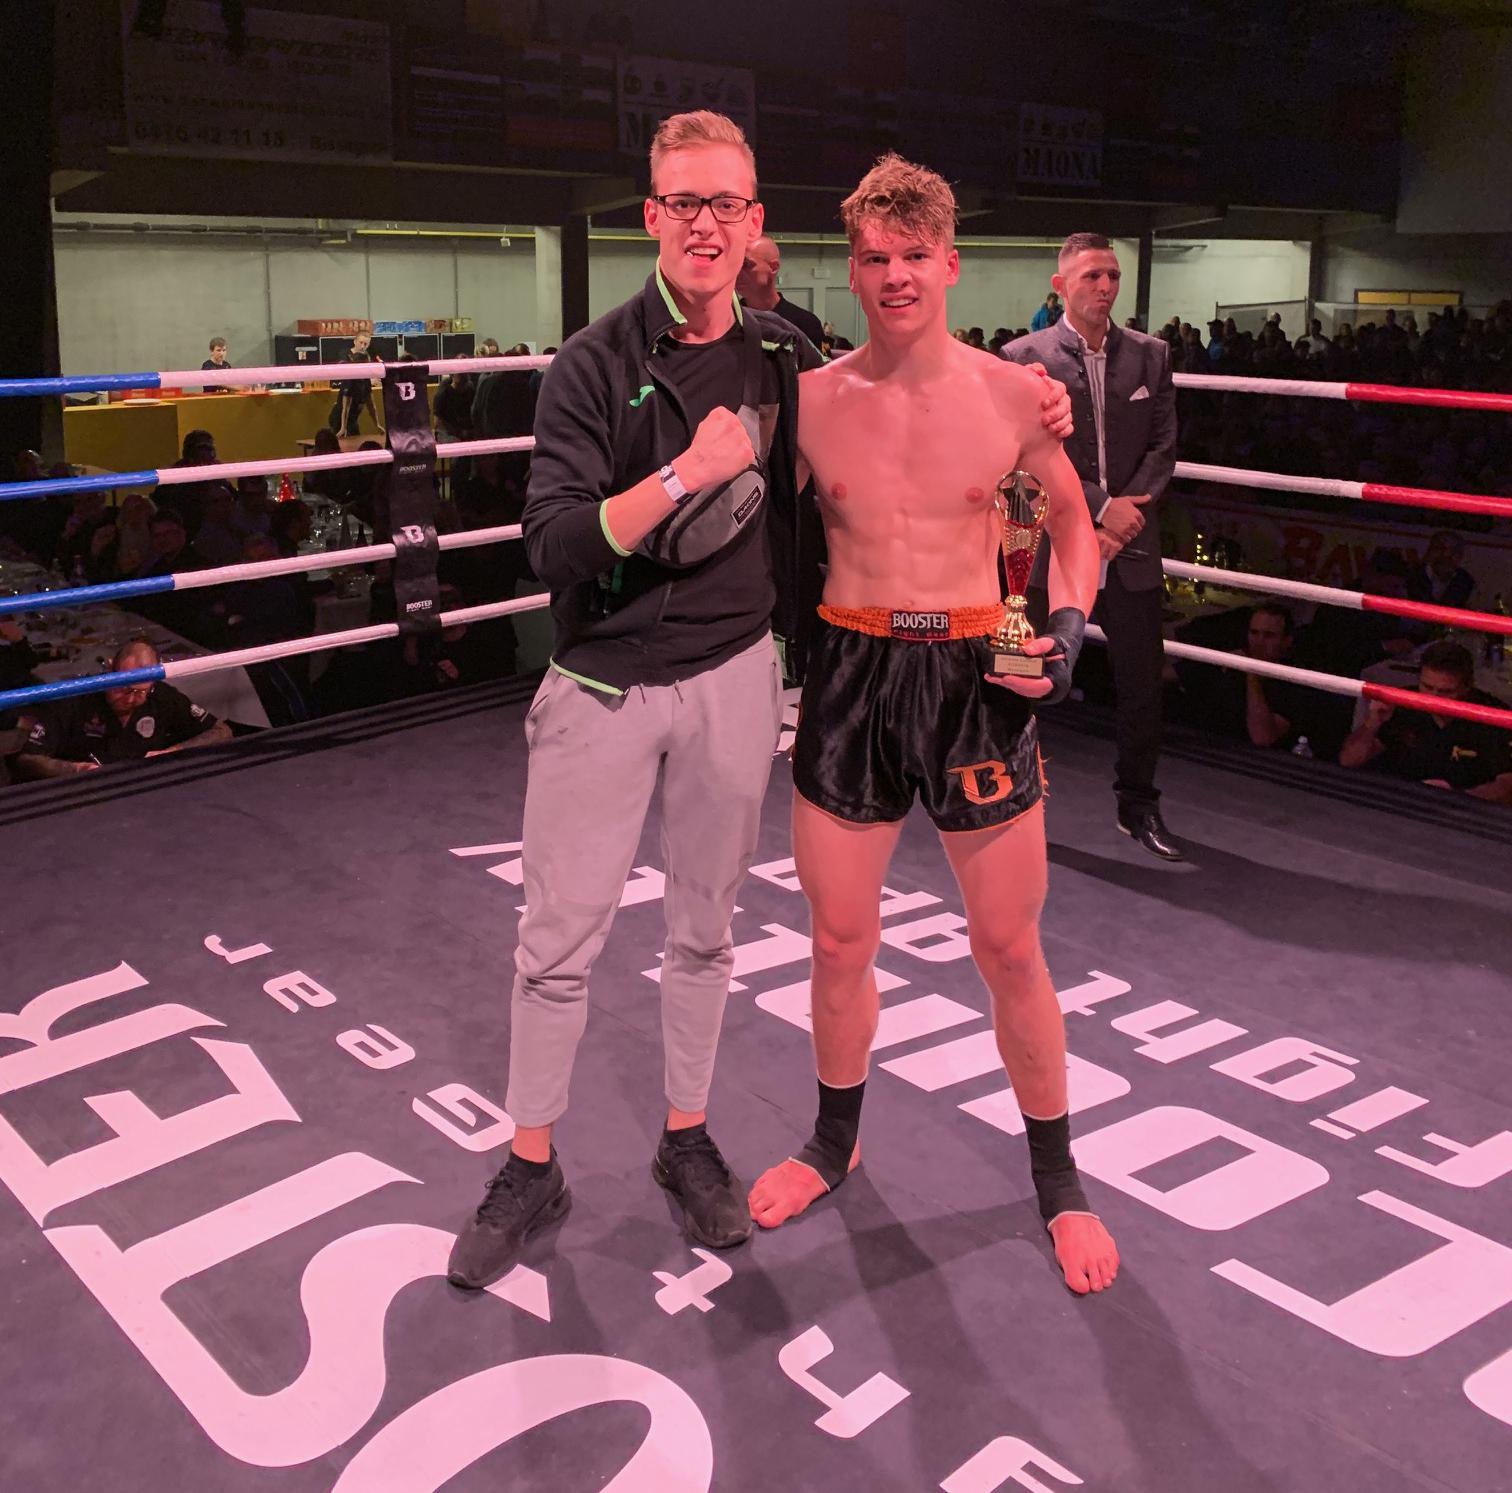 Ultimate Contest te Wevelgem / K1 thaiboxgala in Wevelgem 08/12/2018